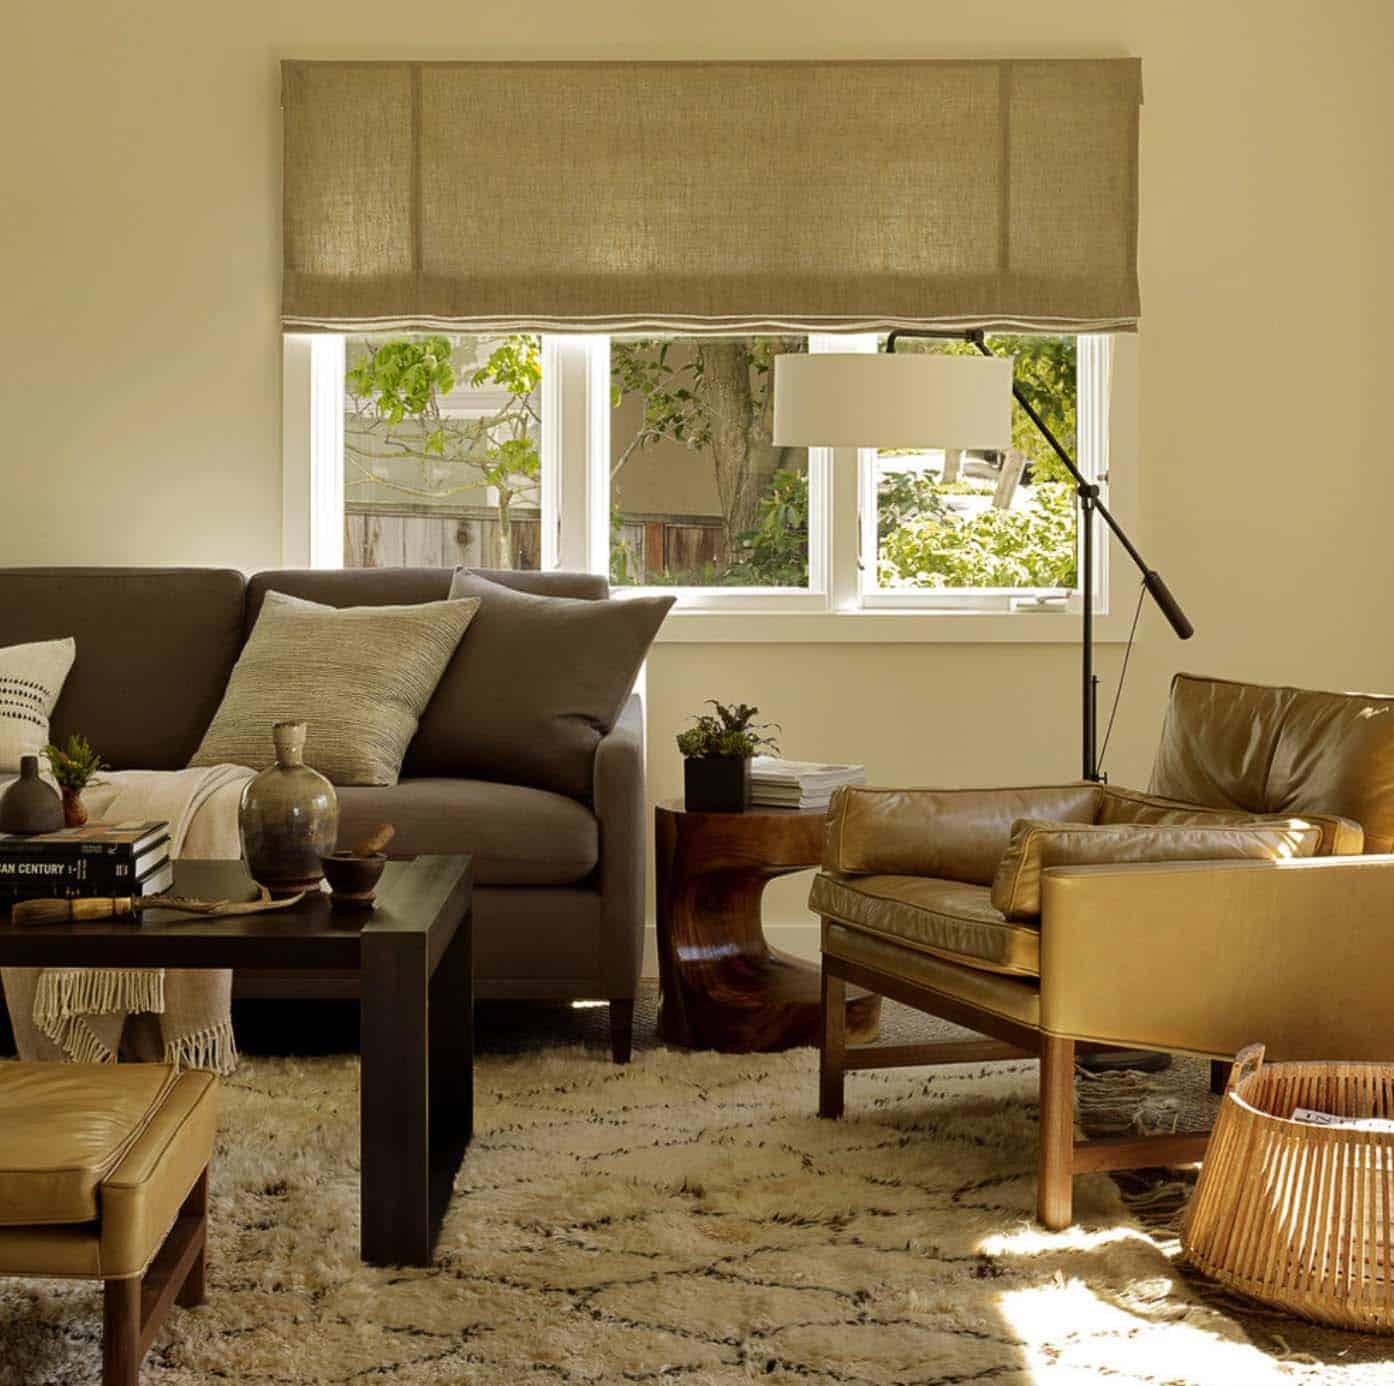 Contemporary Home Design-Jute Interior Design-03-1 Kindesign